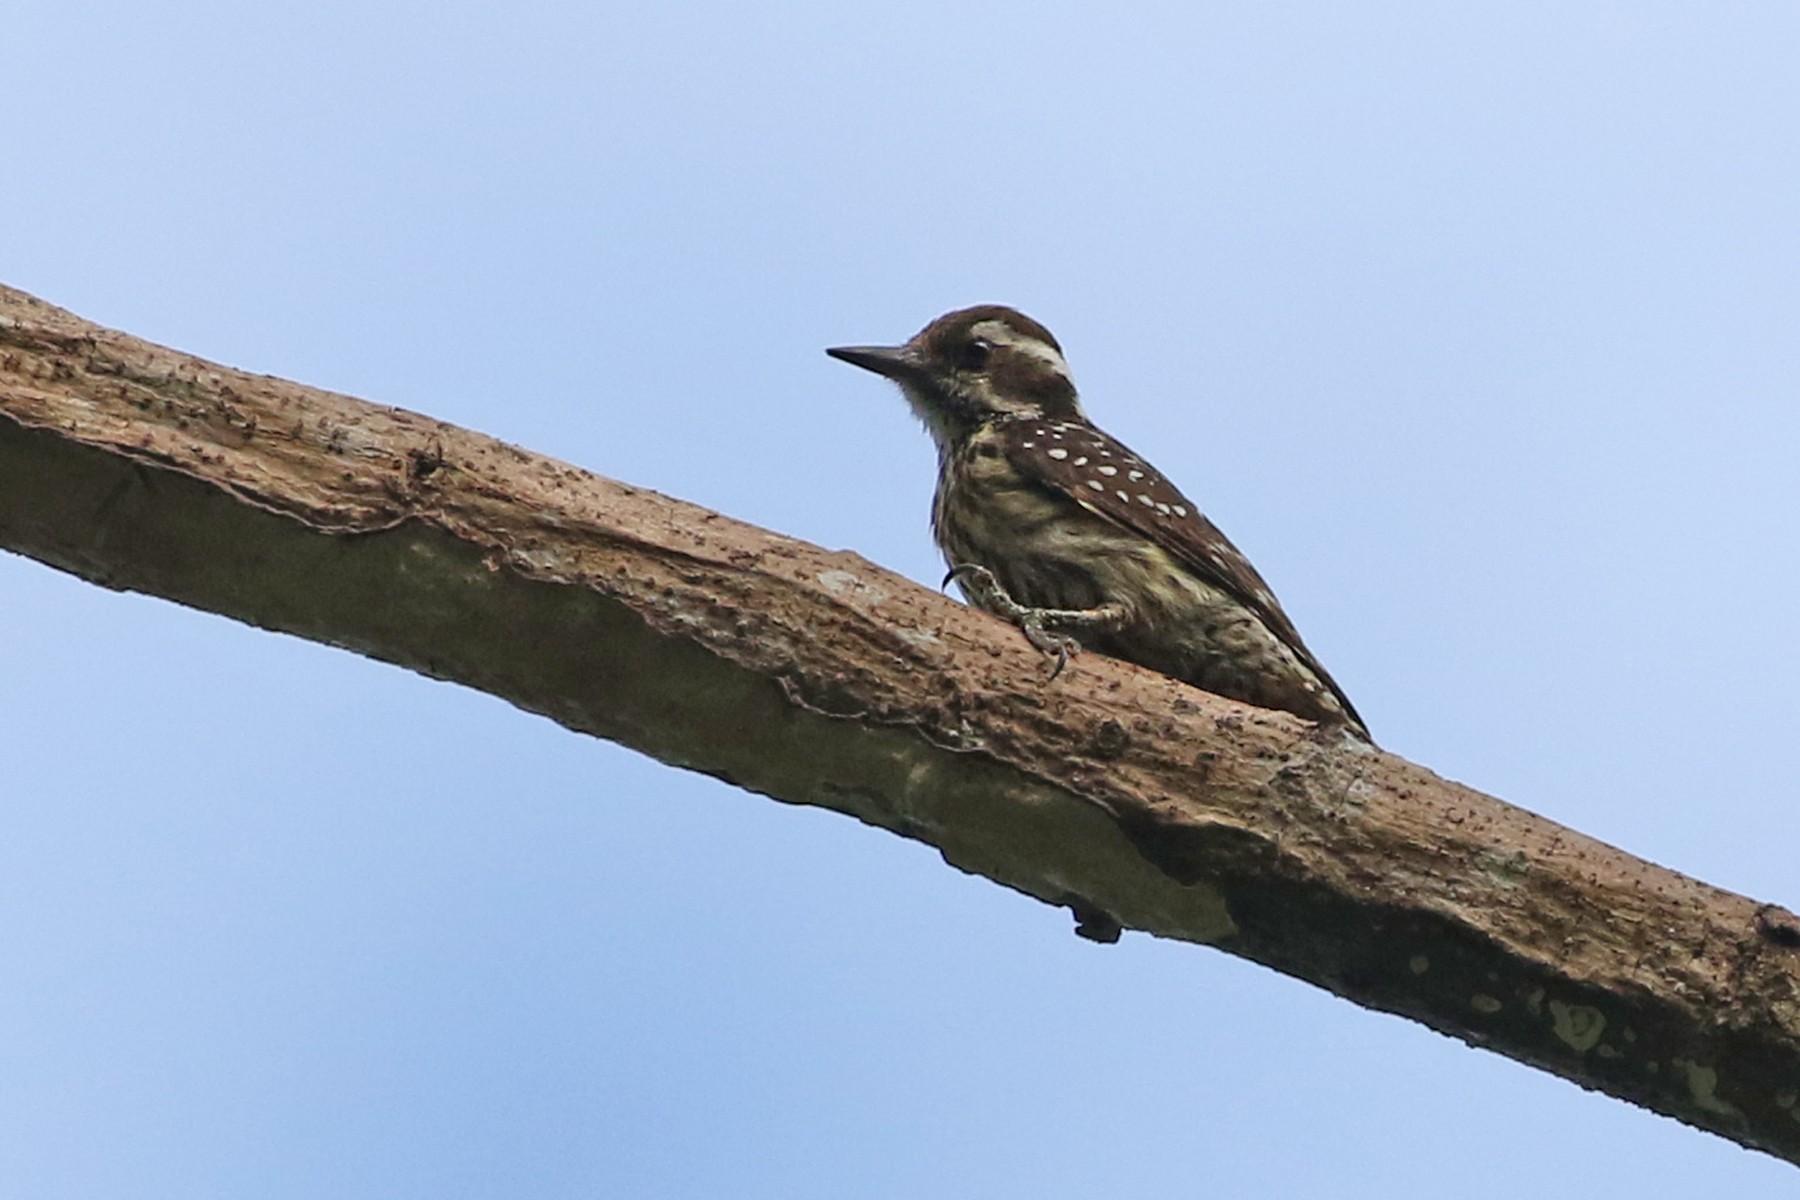 Philippine Woodpecker - Charley Hesse